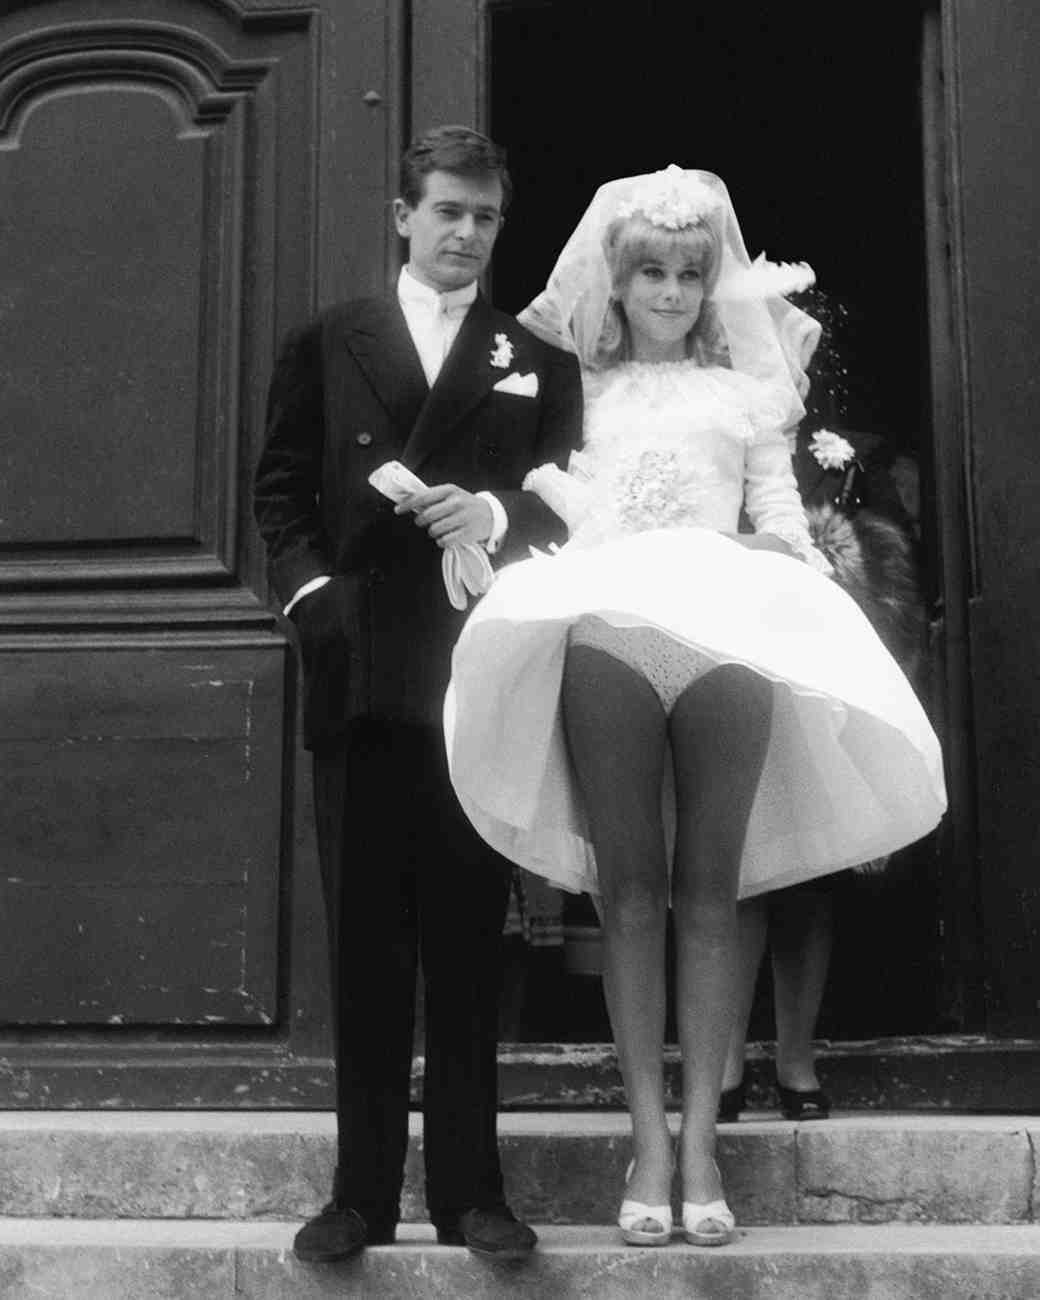 movie-wedding-dresses-vice-and-virtue-catherine-deneuve-0316.jpg